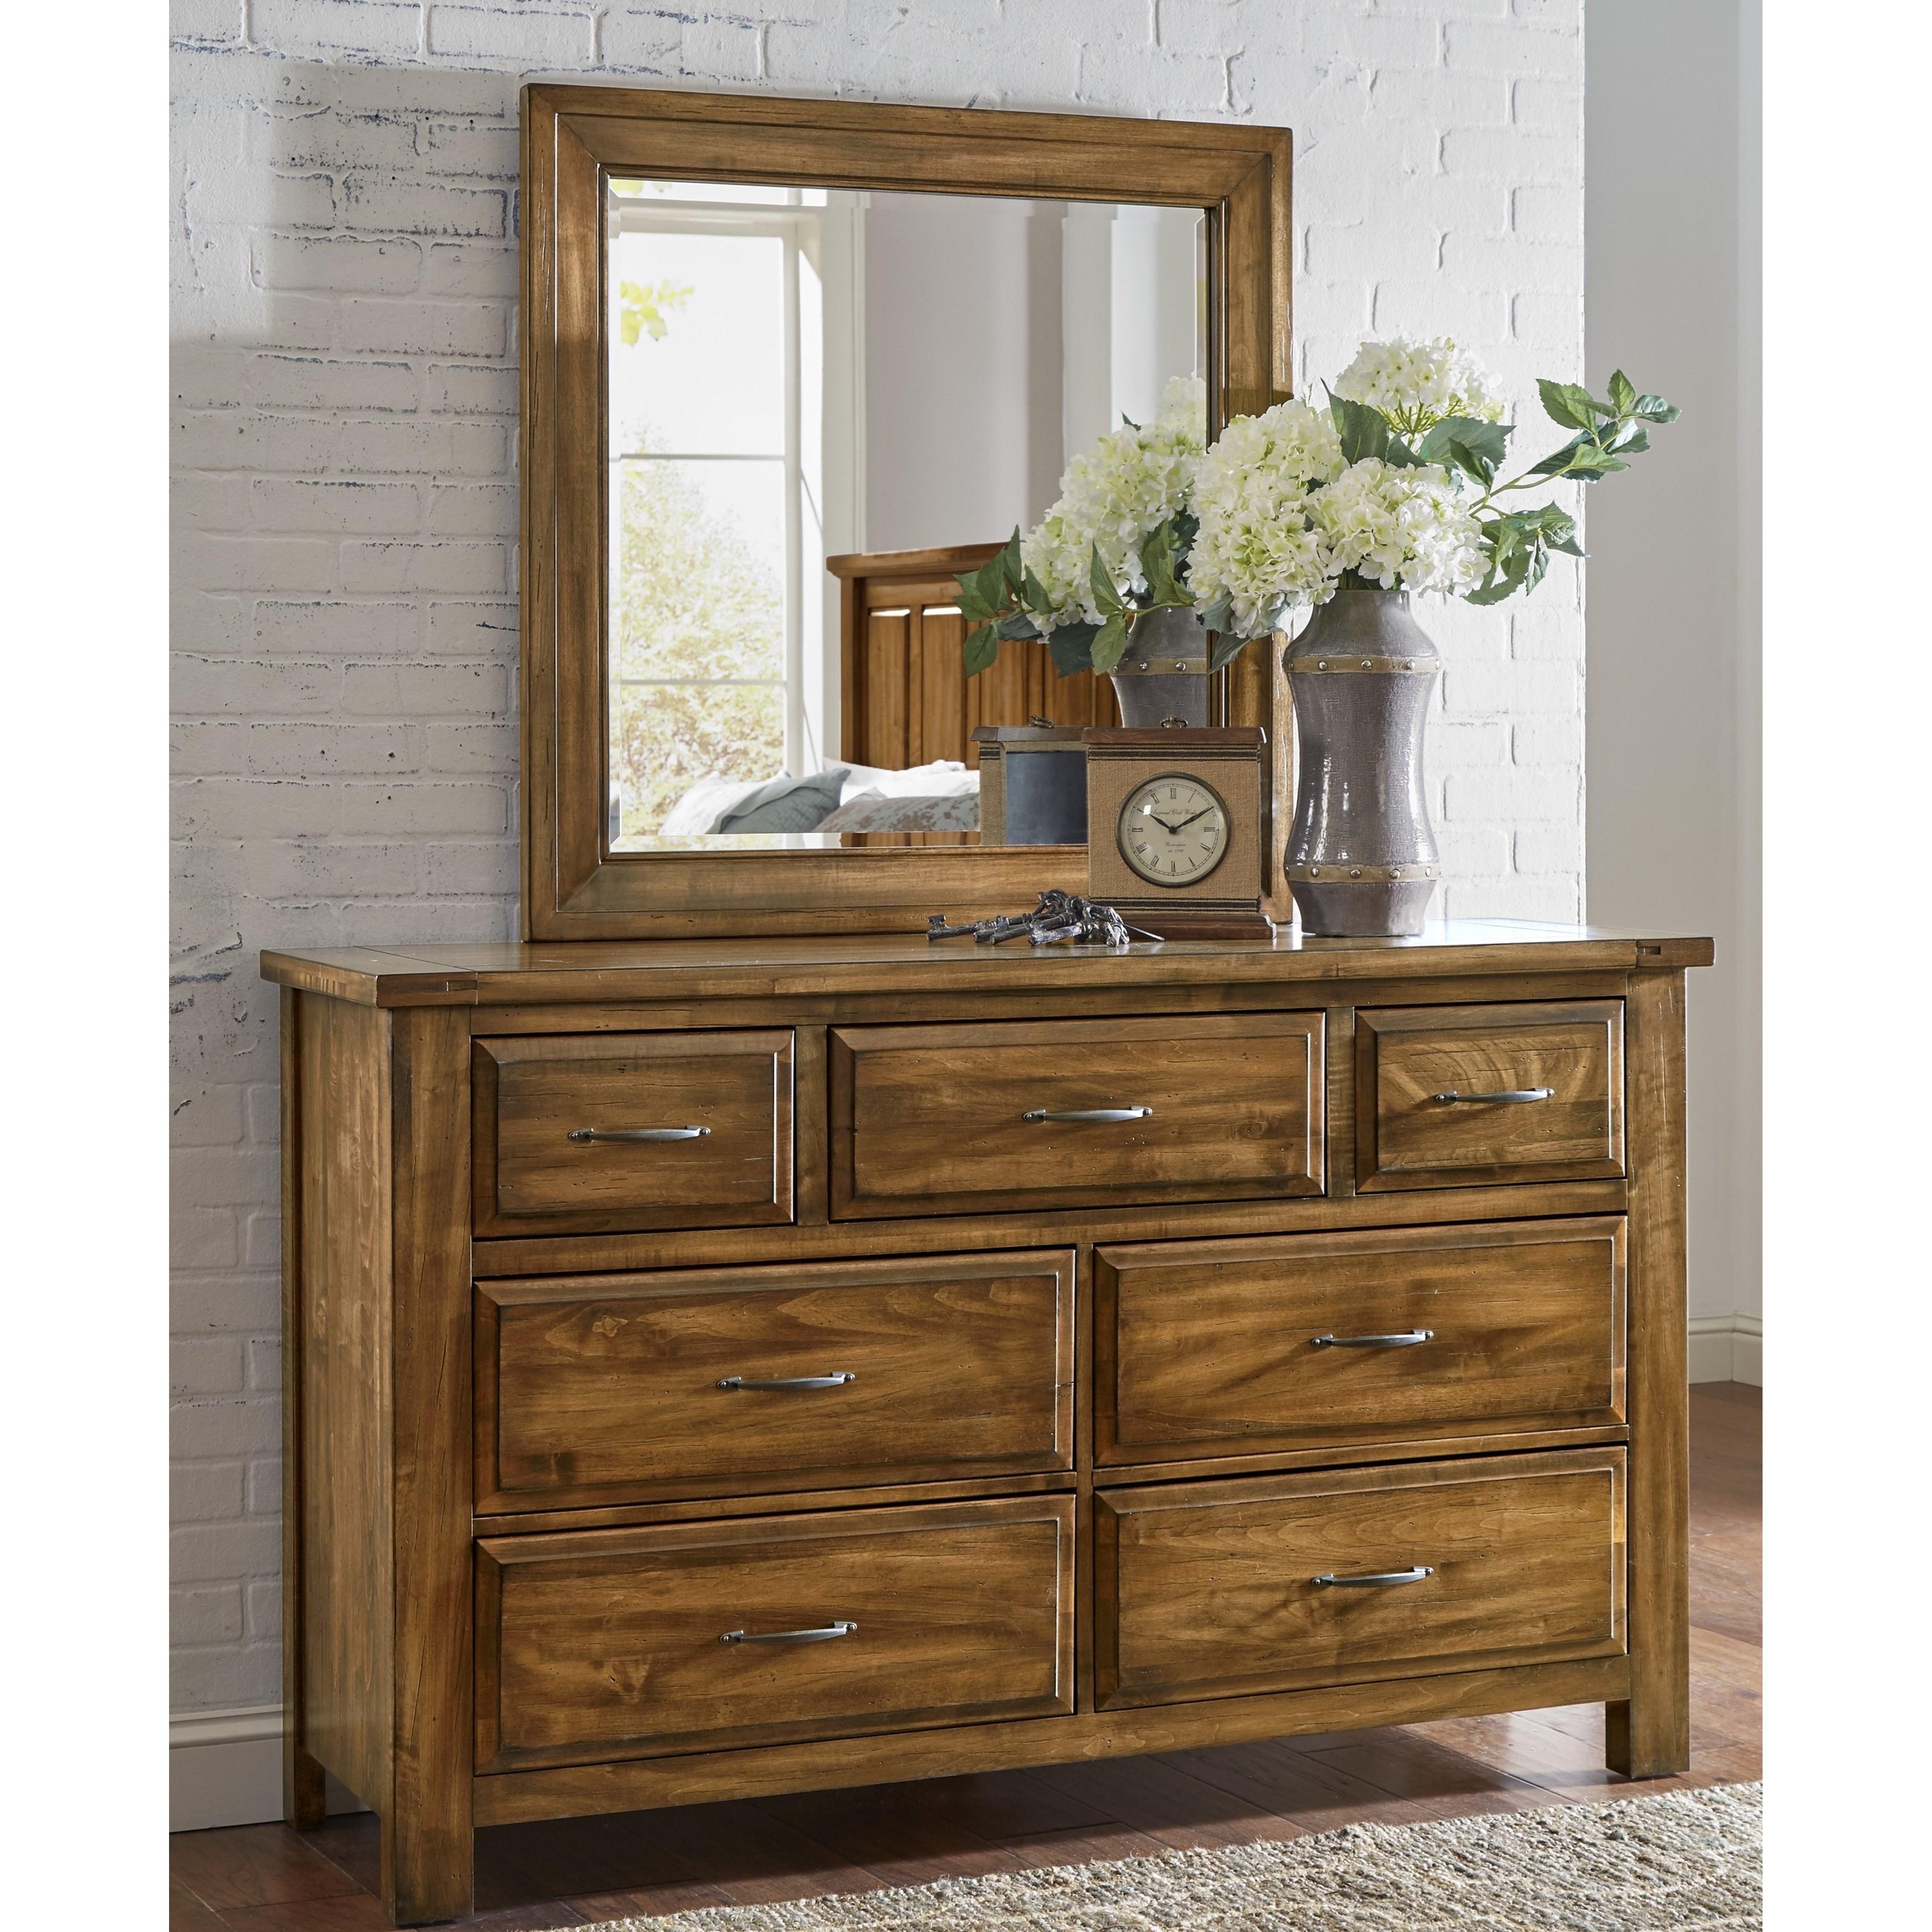 Artisan & Post Maple Road Dresser & Mirror - Item Number: 118-003+446